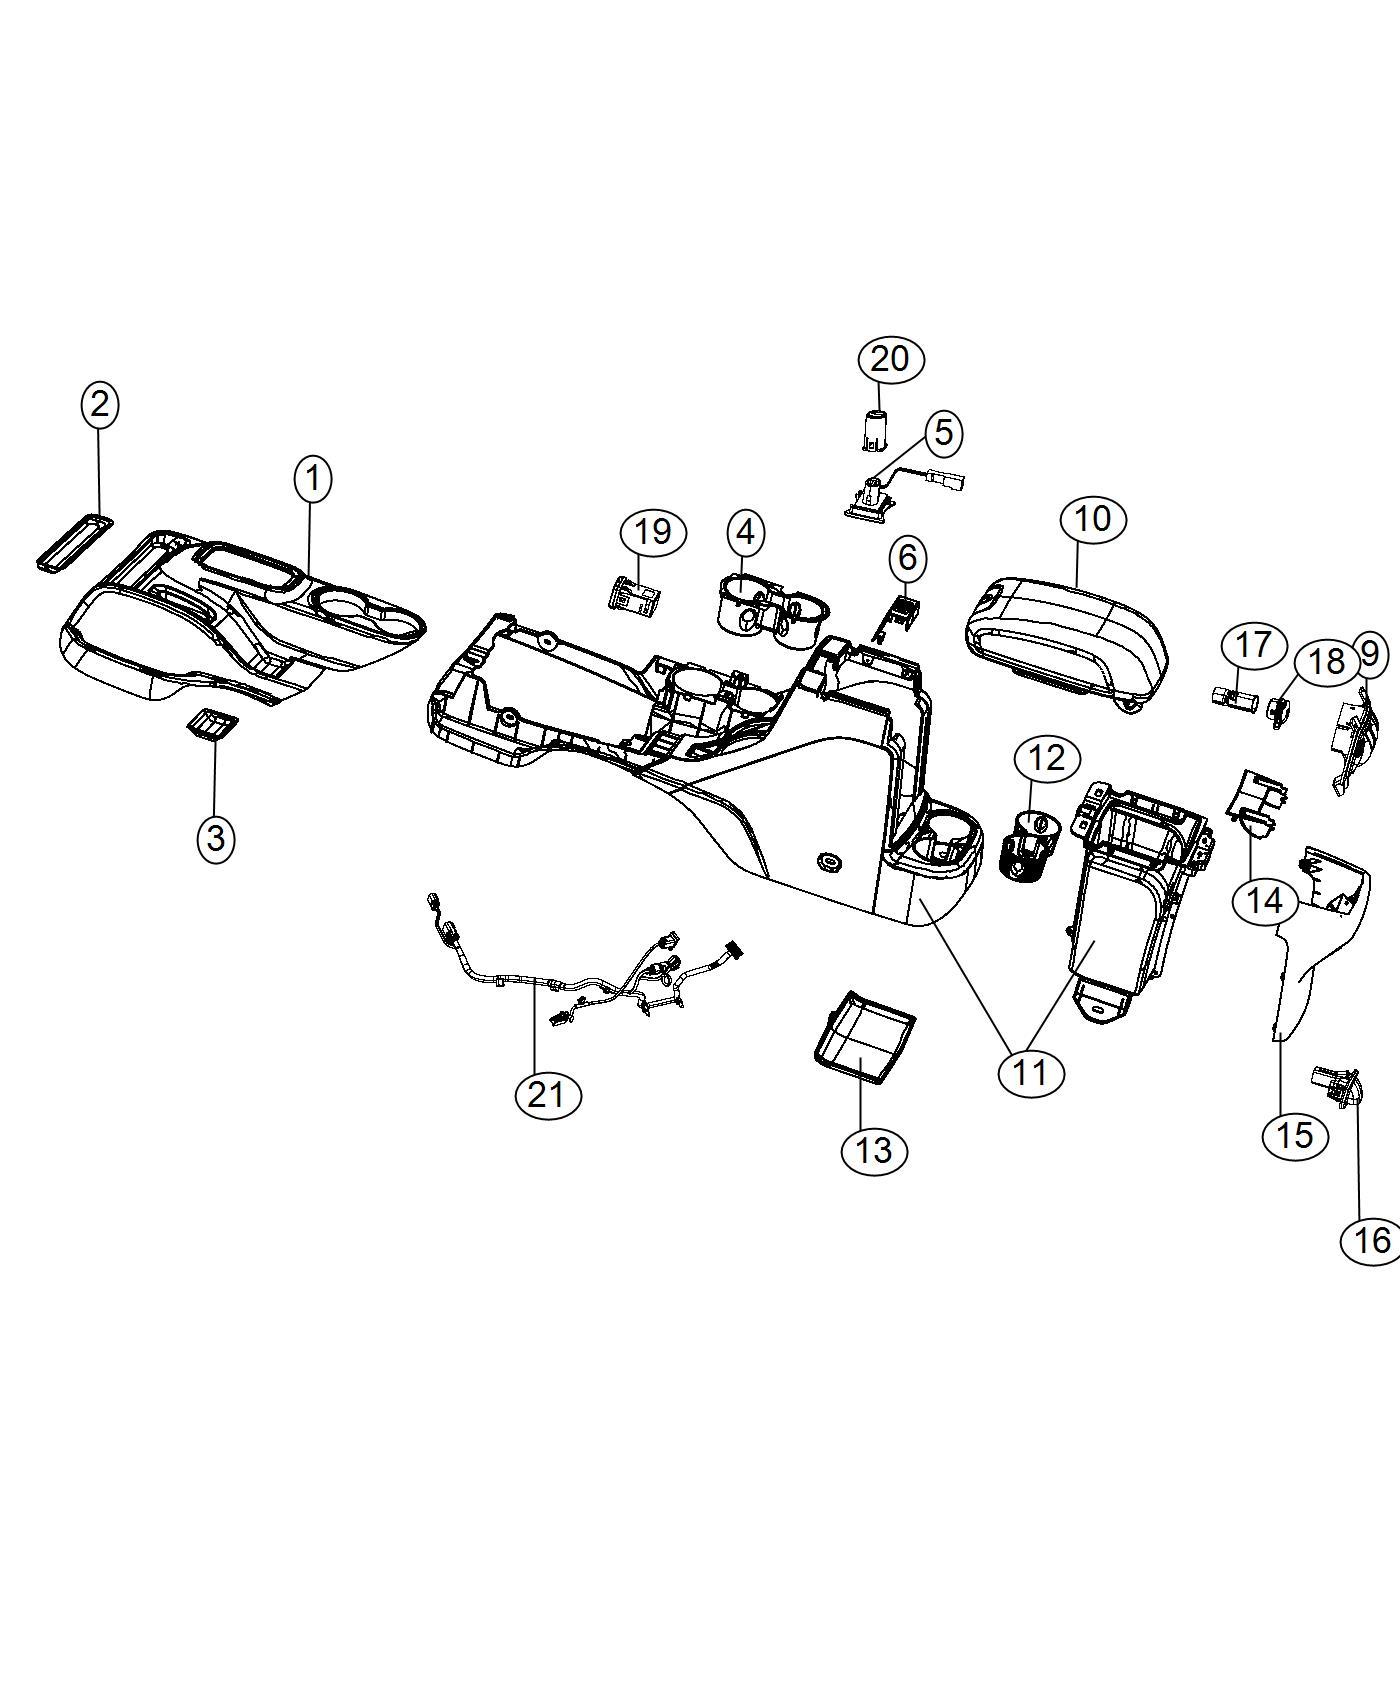 Jeep Wrangler Lamp Cup Holder Trim No Description